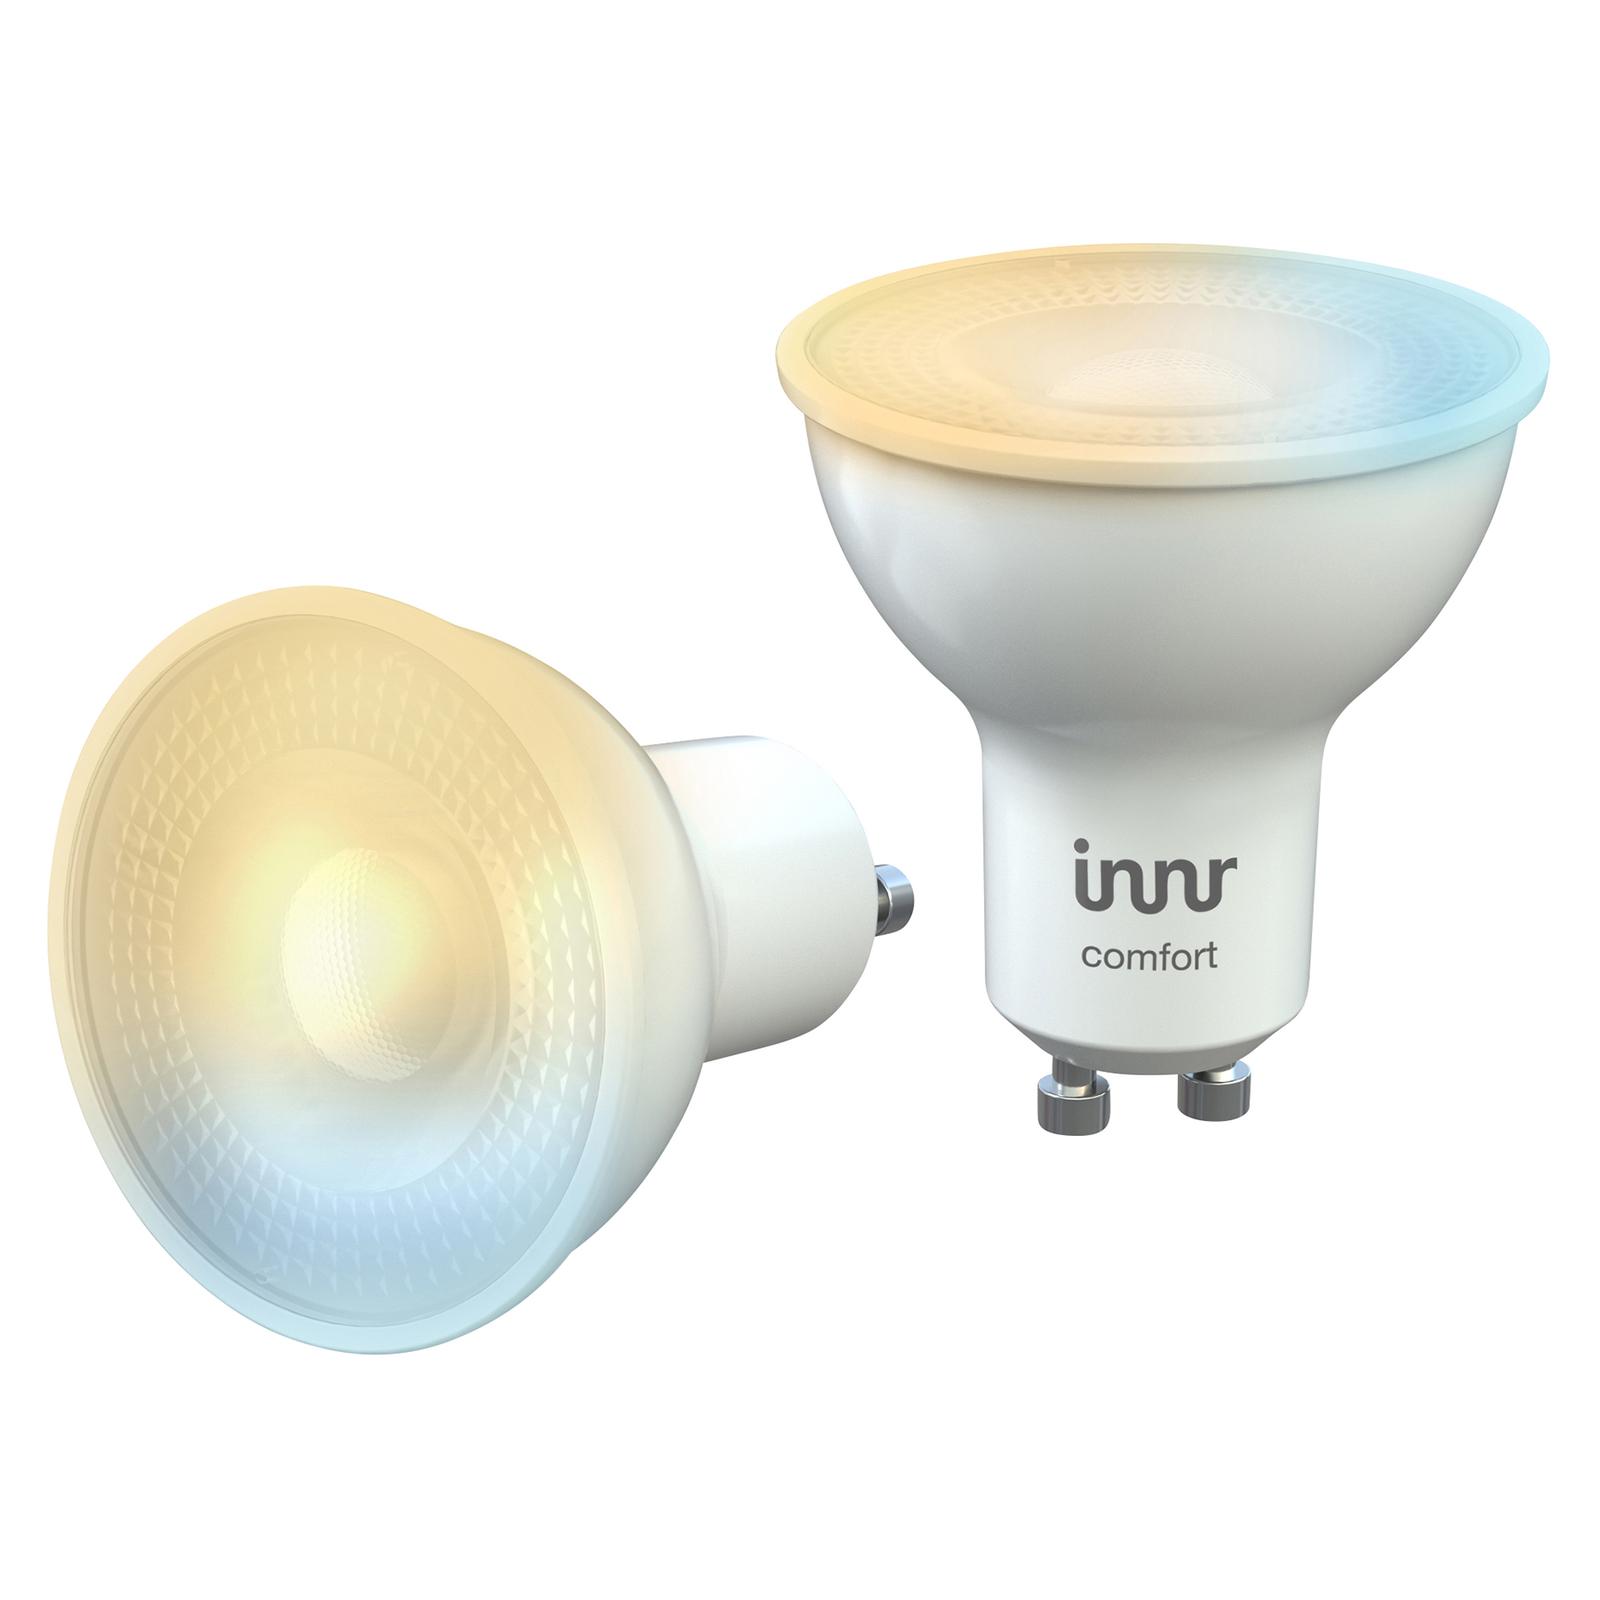 Innr spot LED GU10 5W 350lm, 2200-5000K, 2 szt.